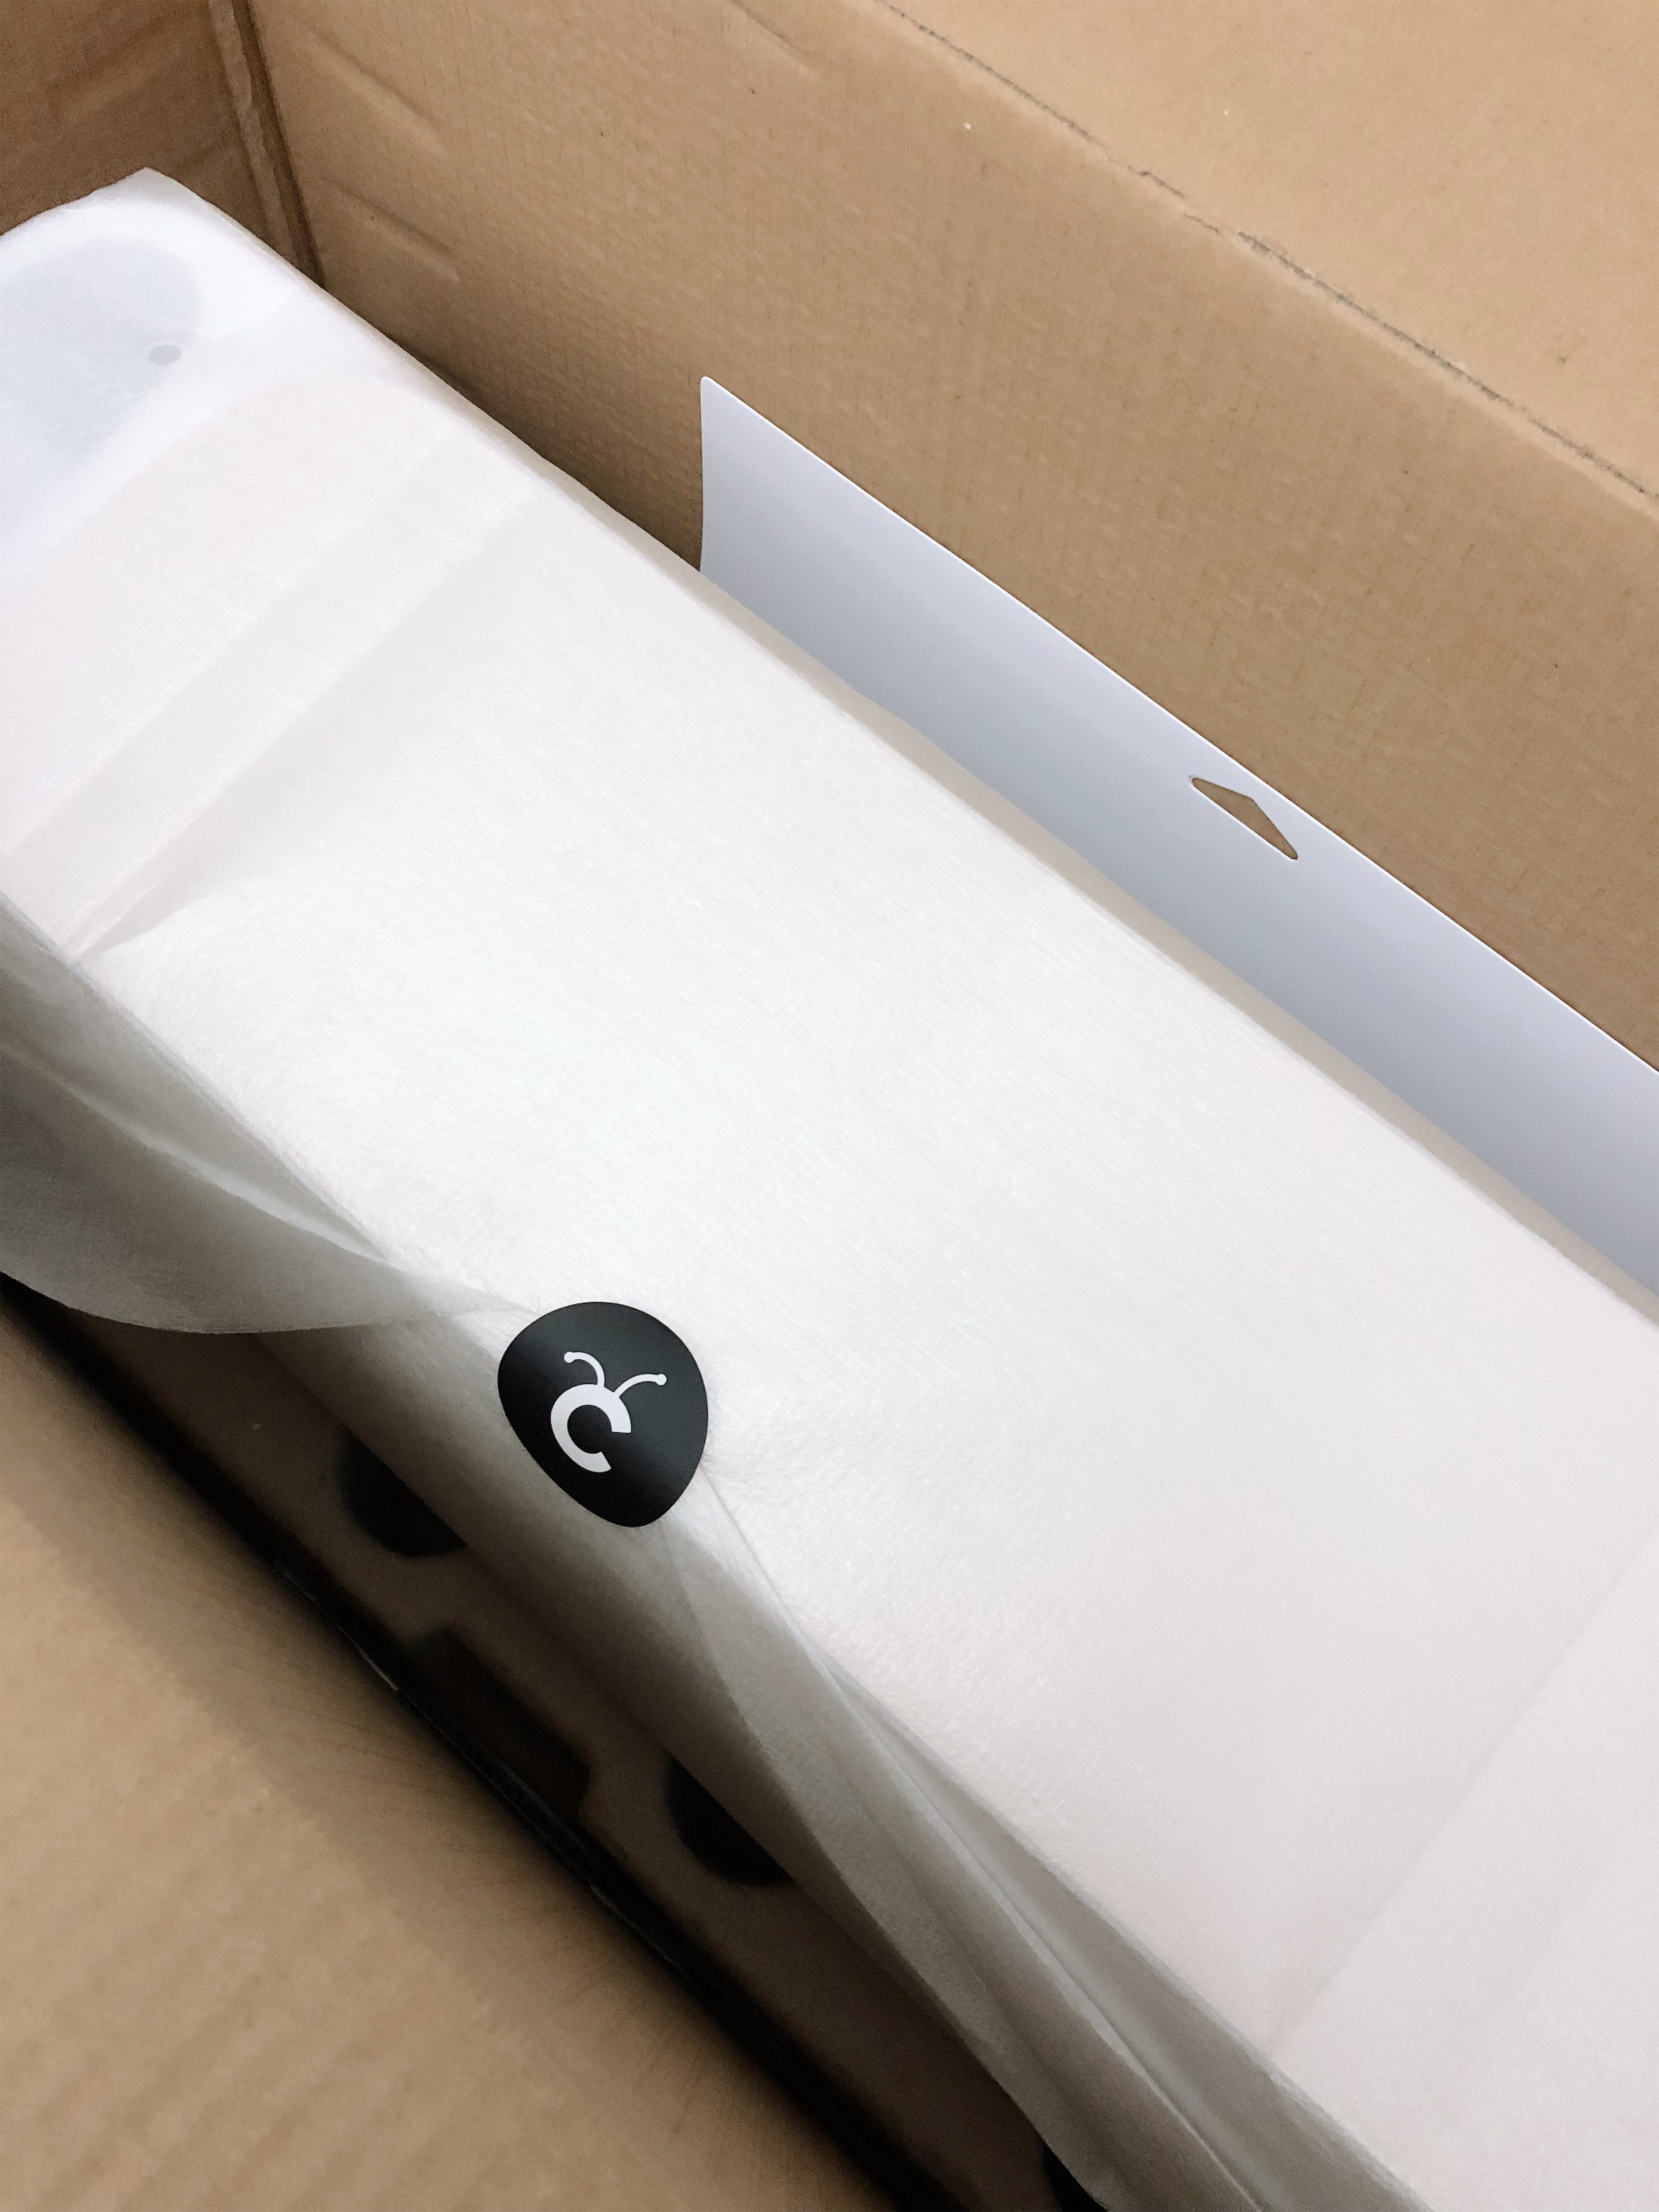 unboxing-cricut-maker-1.jpg